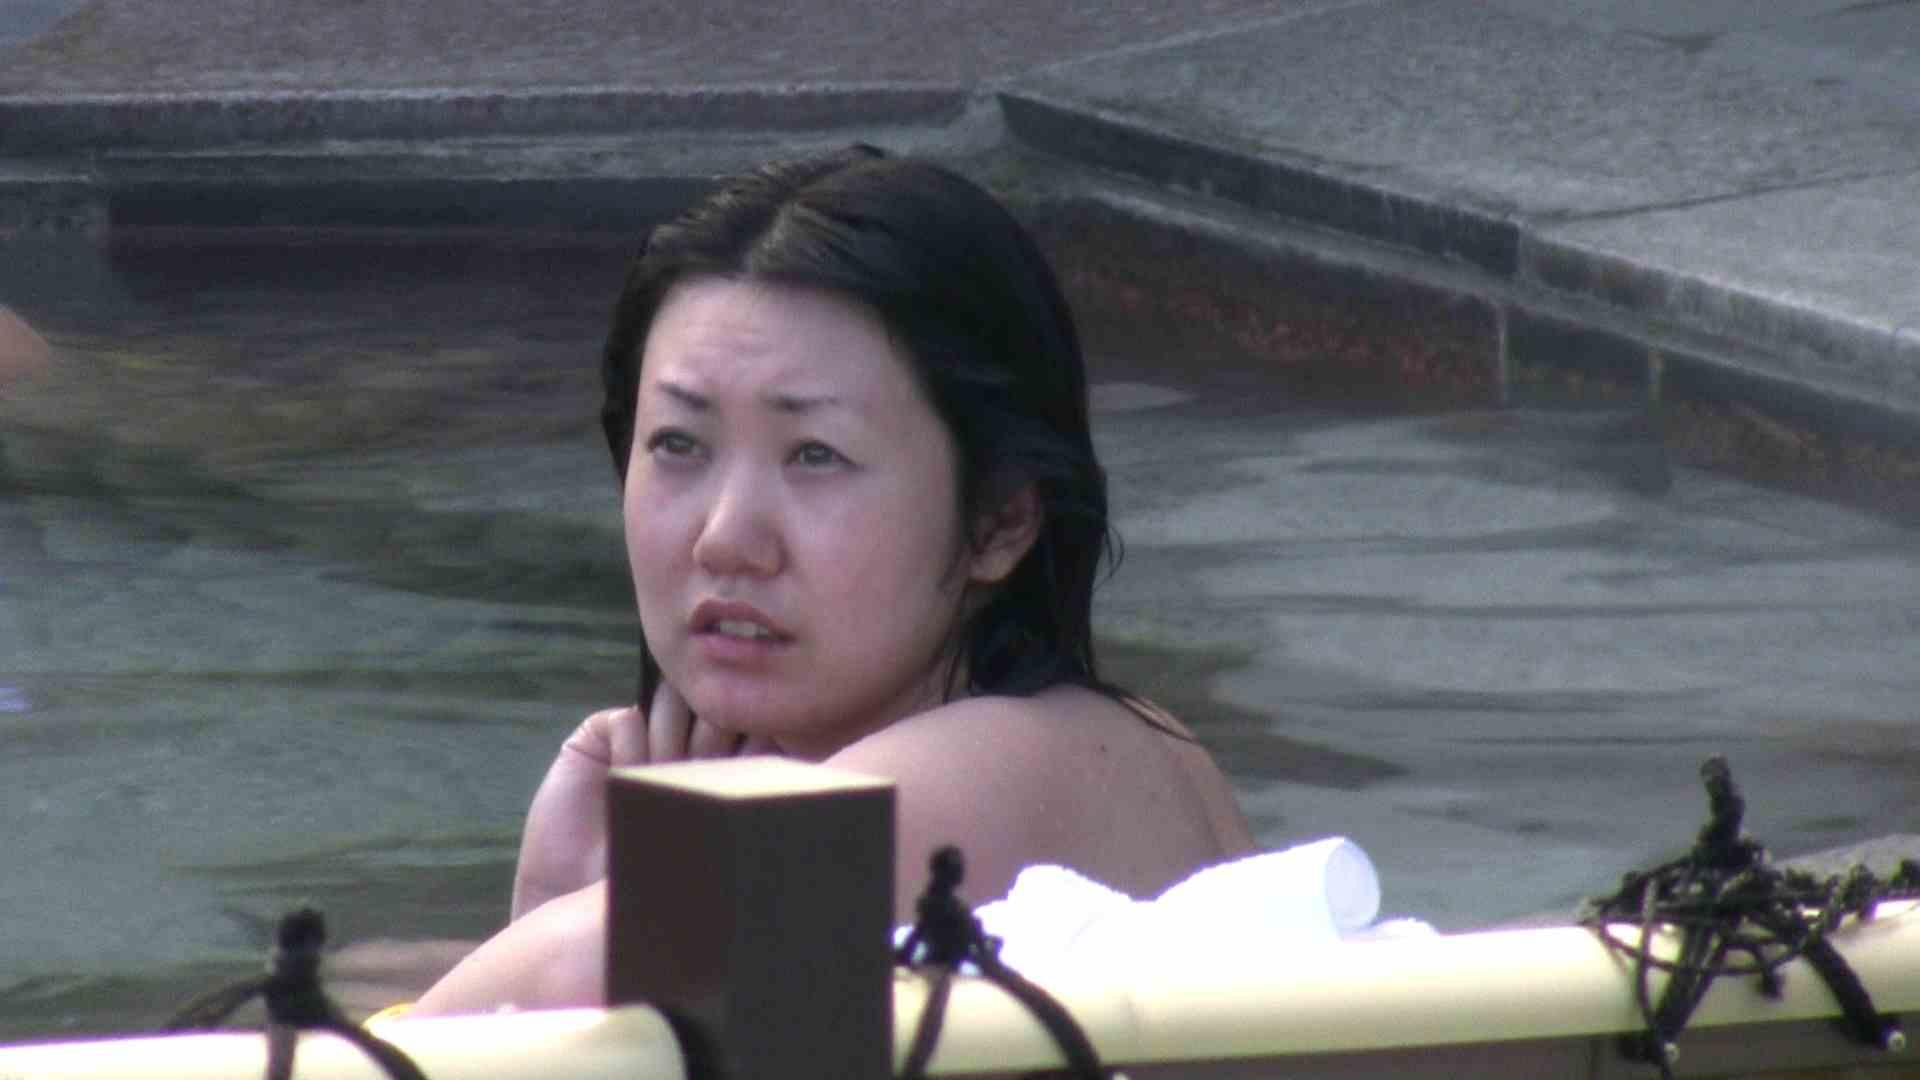 Aquaな露天風呂Vol.117 盗撮師作品  97pic 69